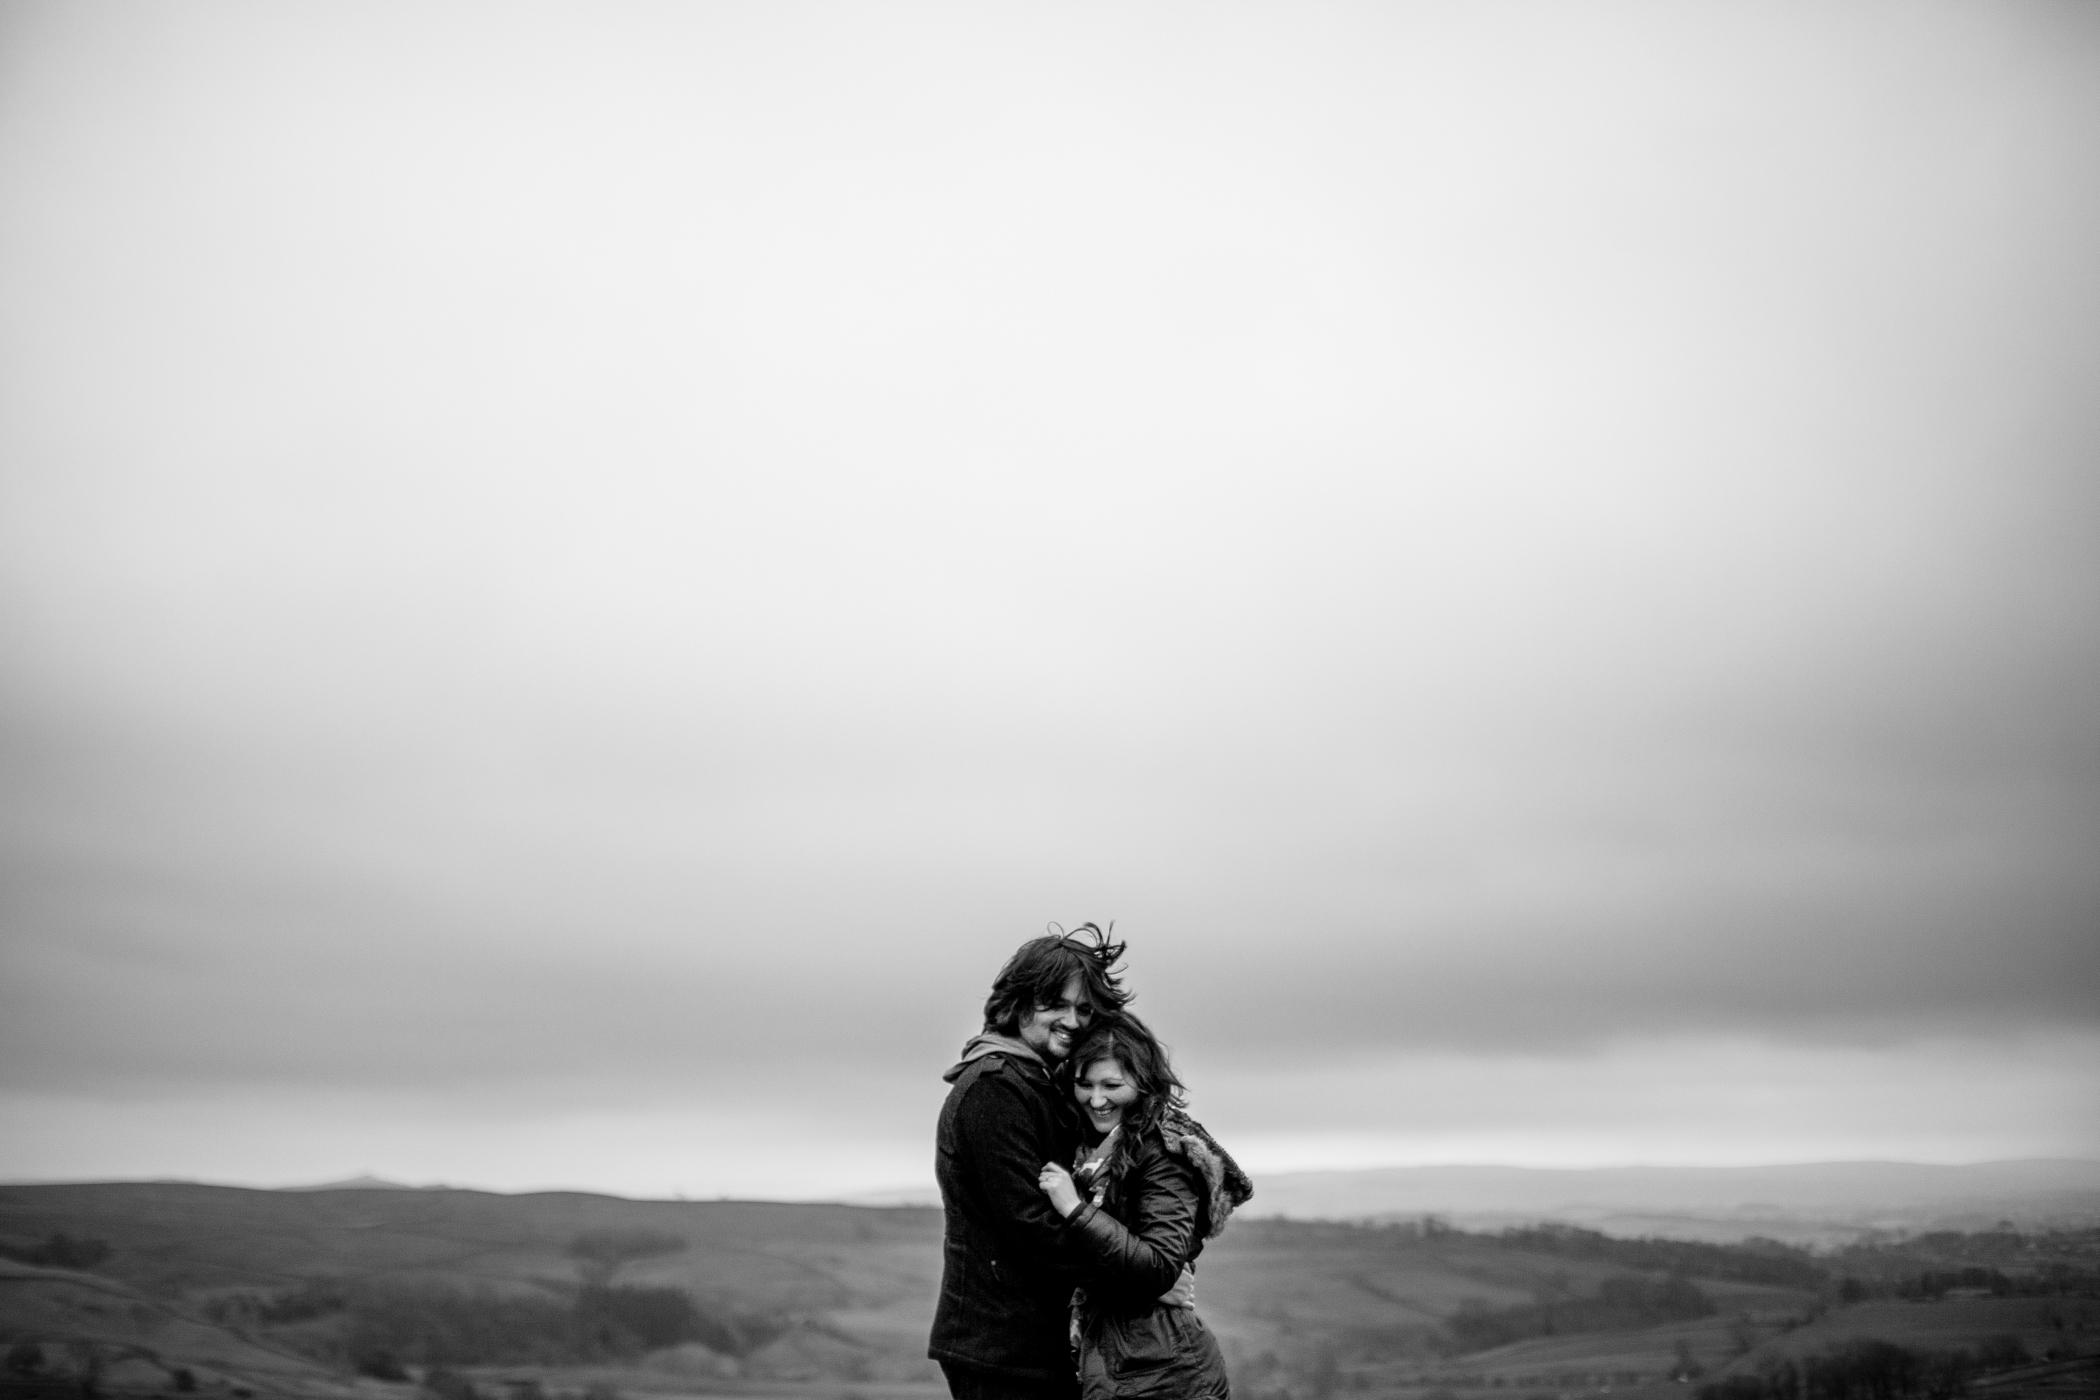 sansom wedding photography malham cove-21